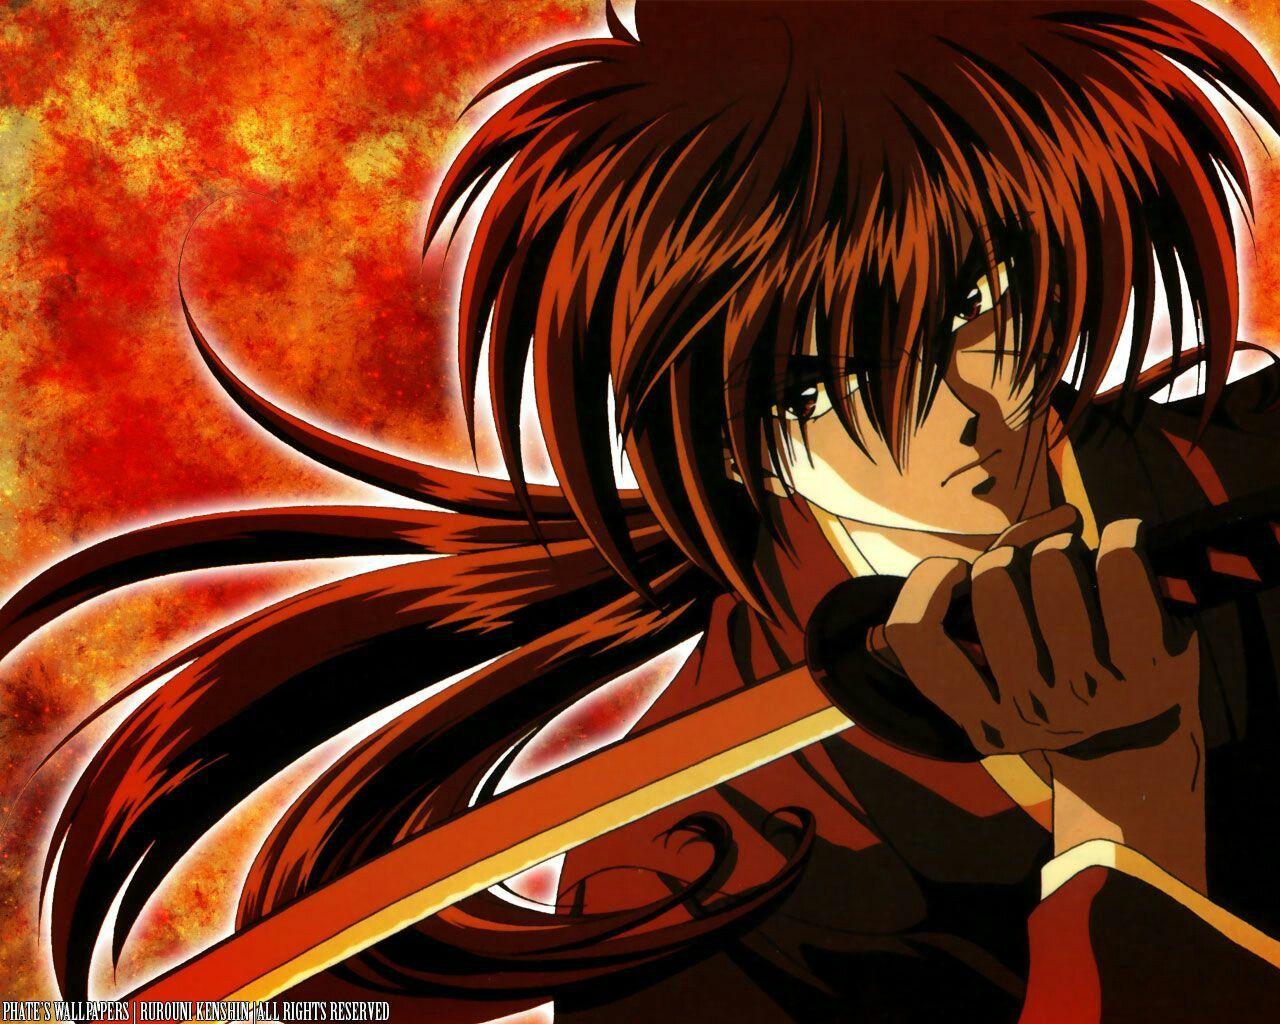 Himura Kenshin Rurouni Kenshin. Rurouni kenshin, Anime